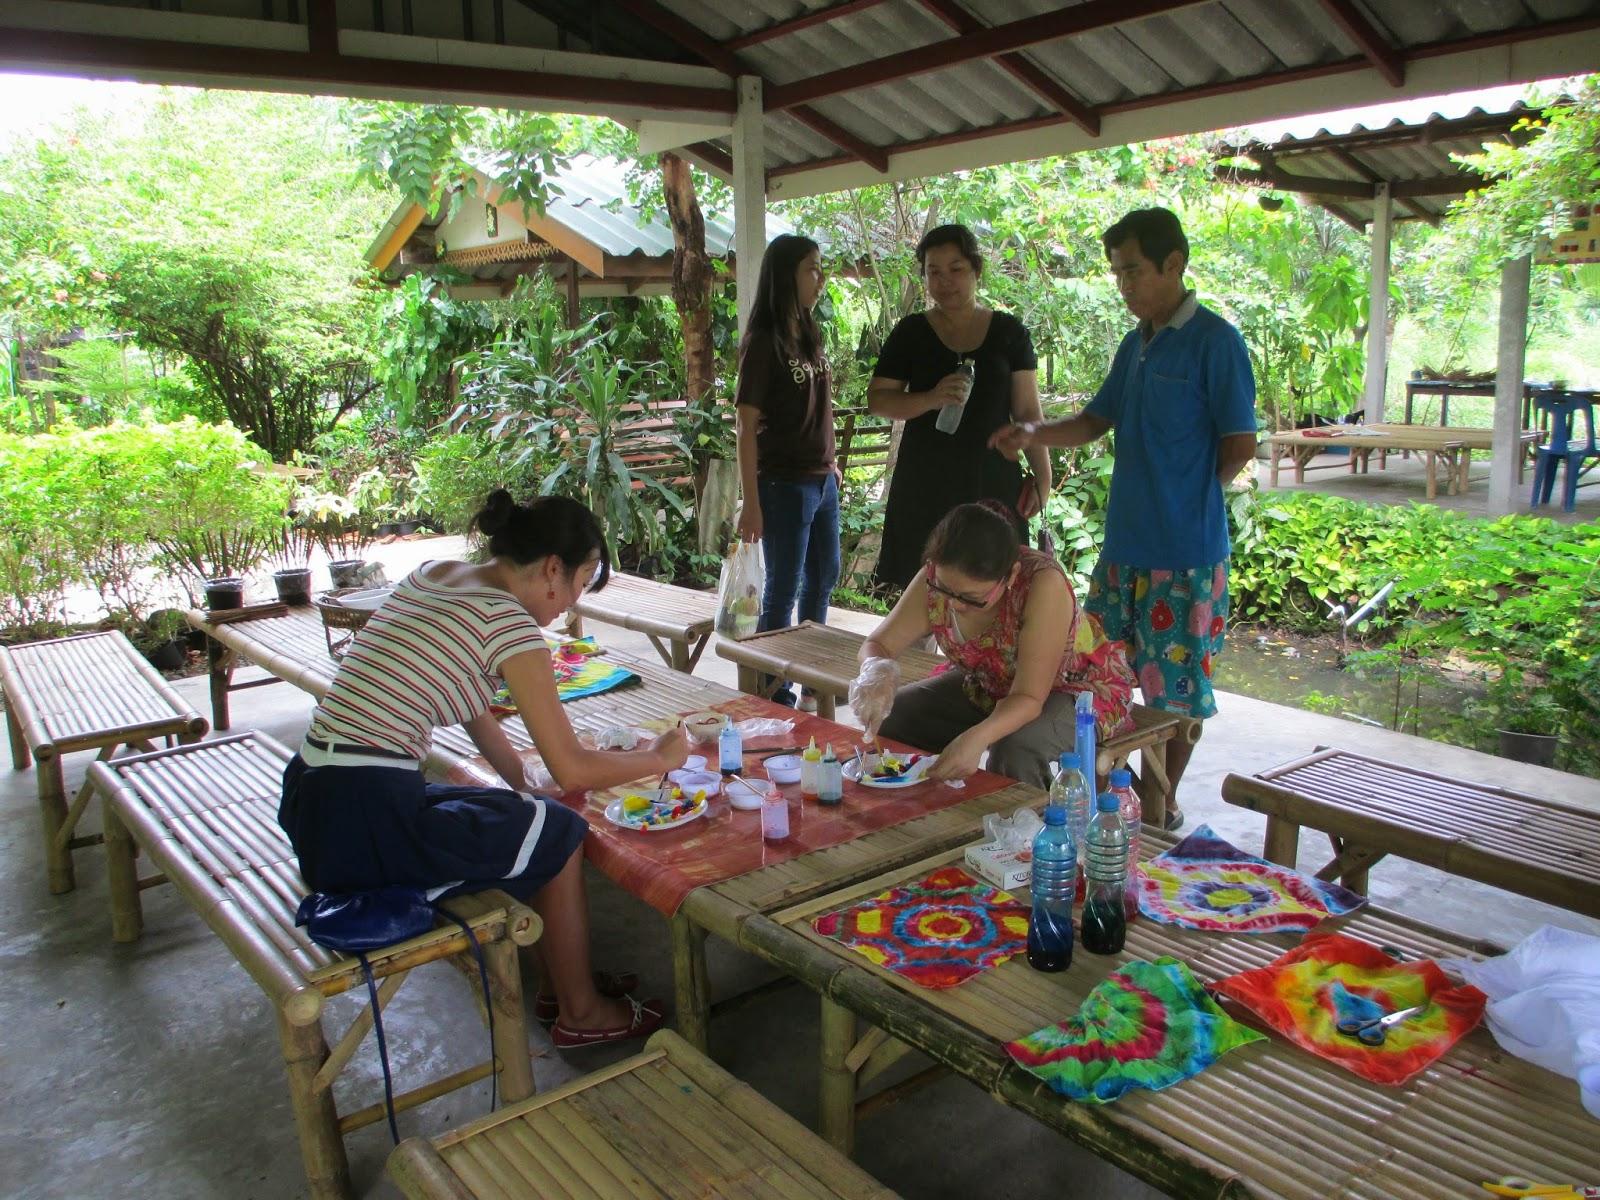 manuelimson Bangkok Day Trip 1 Floating Market Batik Painting